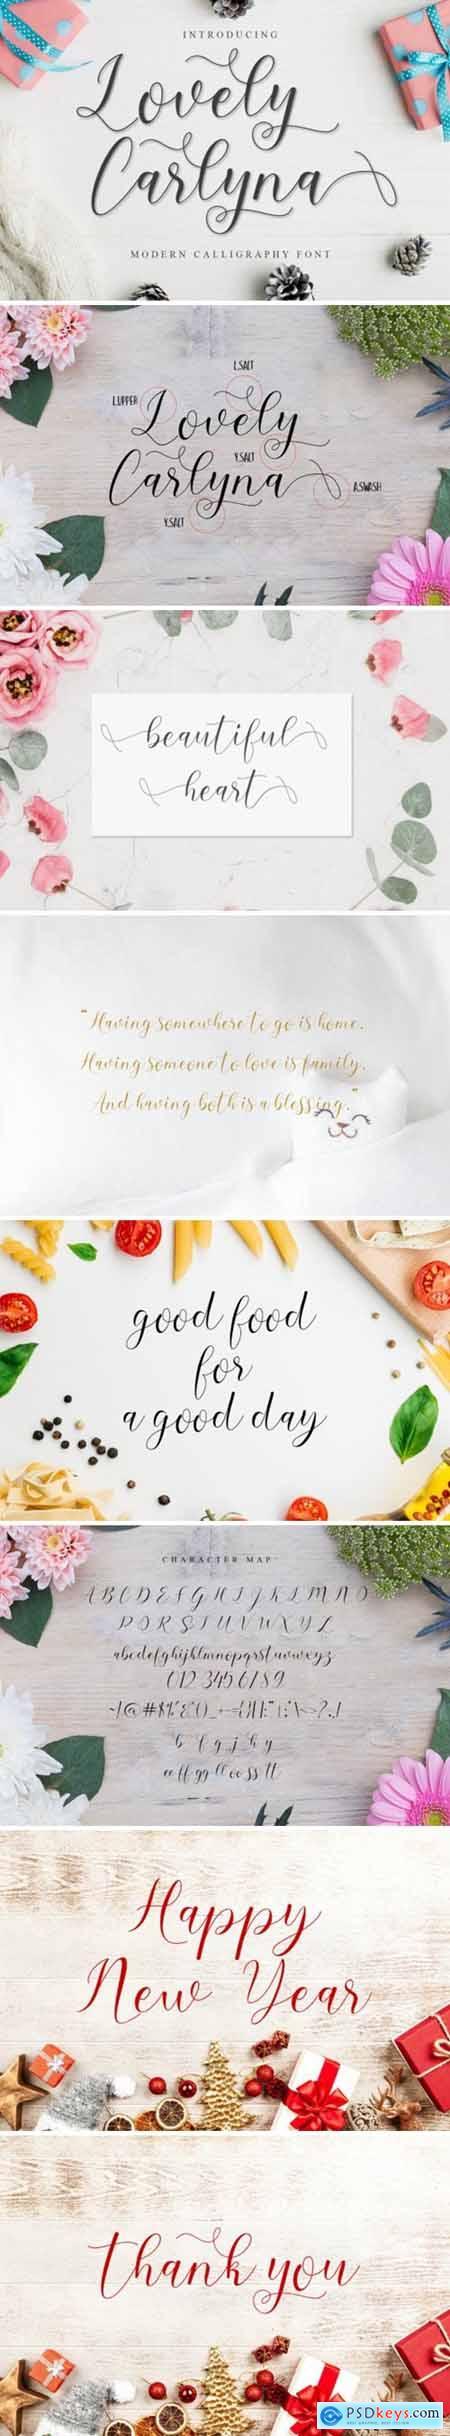 Lovely Carlyna Font